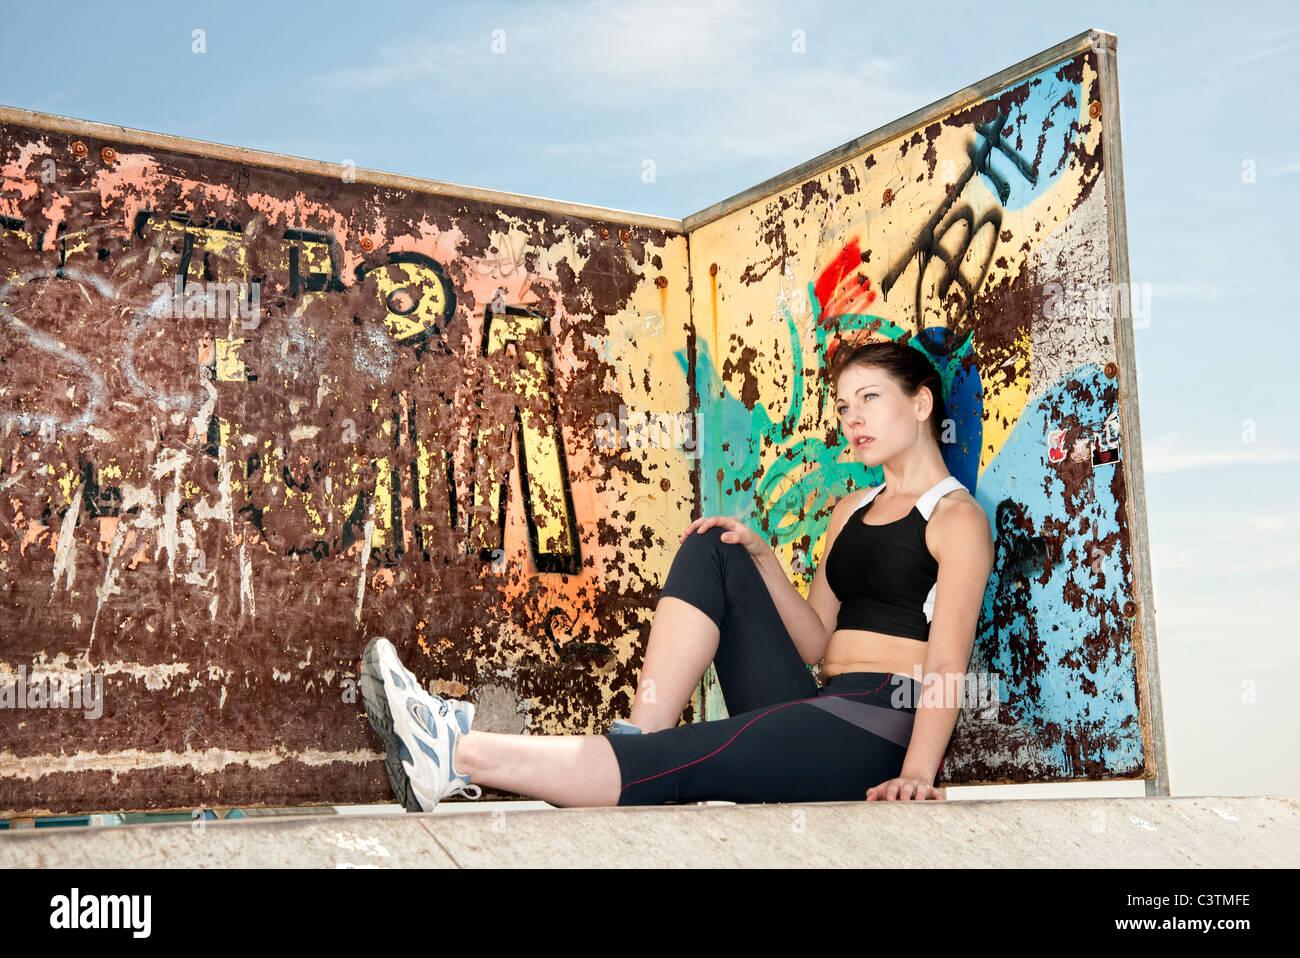 Graffiti wall training - Stock Photo Woman Resting After Training And Keeping Fit Sitting By A Graffiti Wall